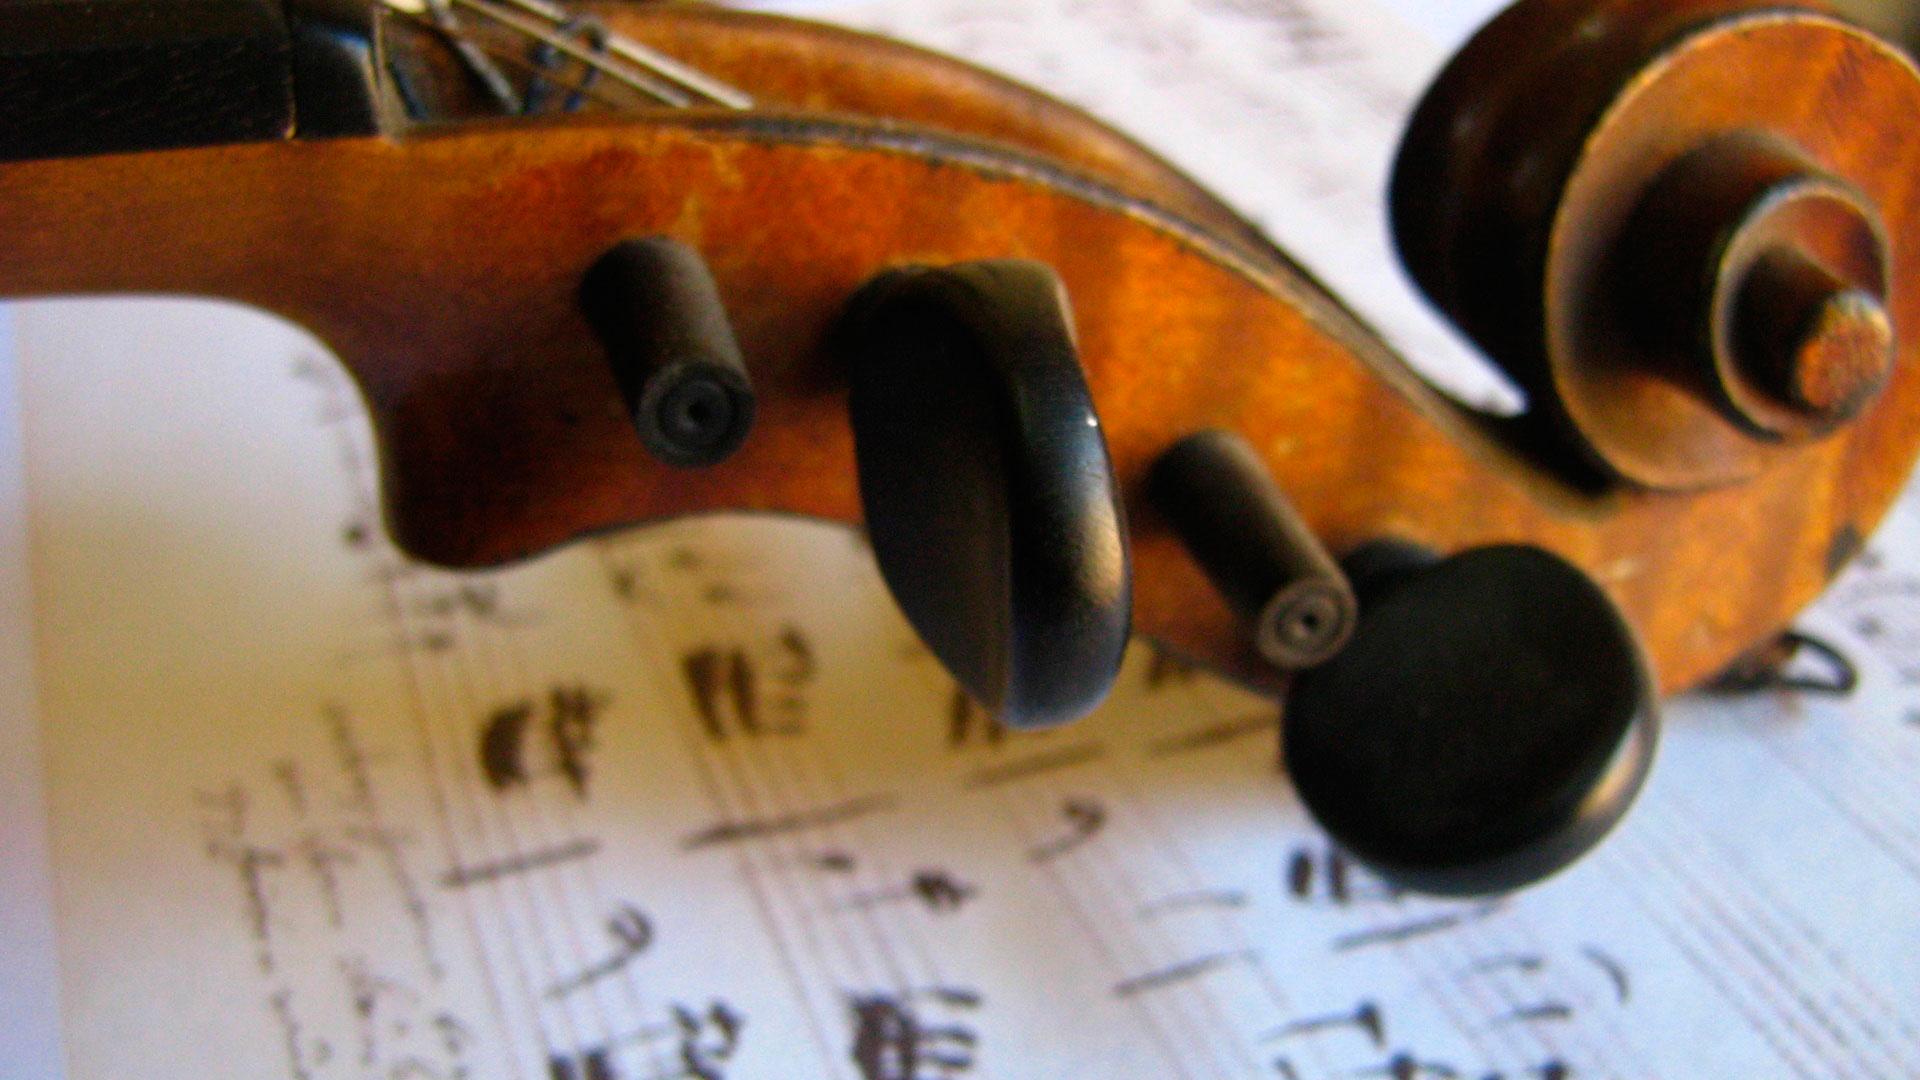 Музыка классическая музыка старая